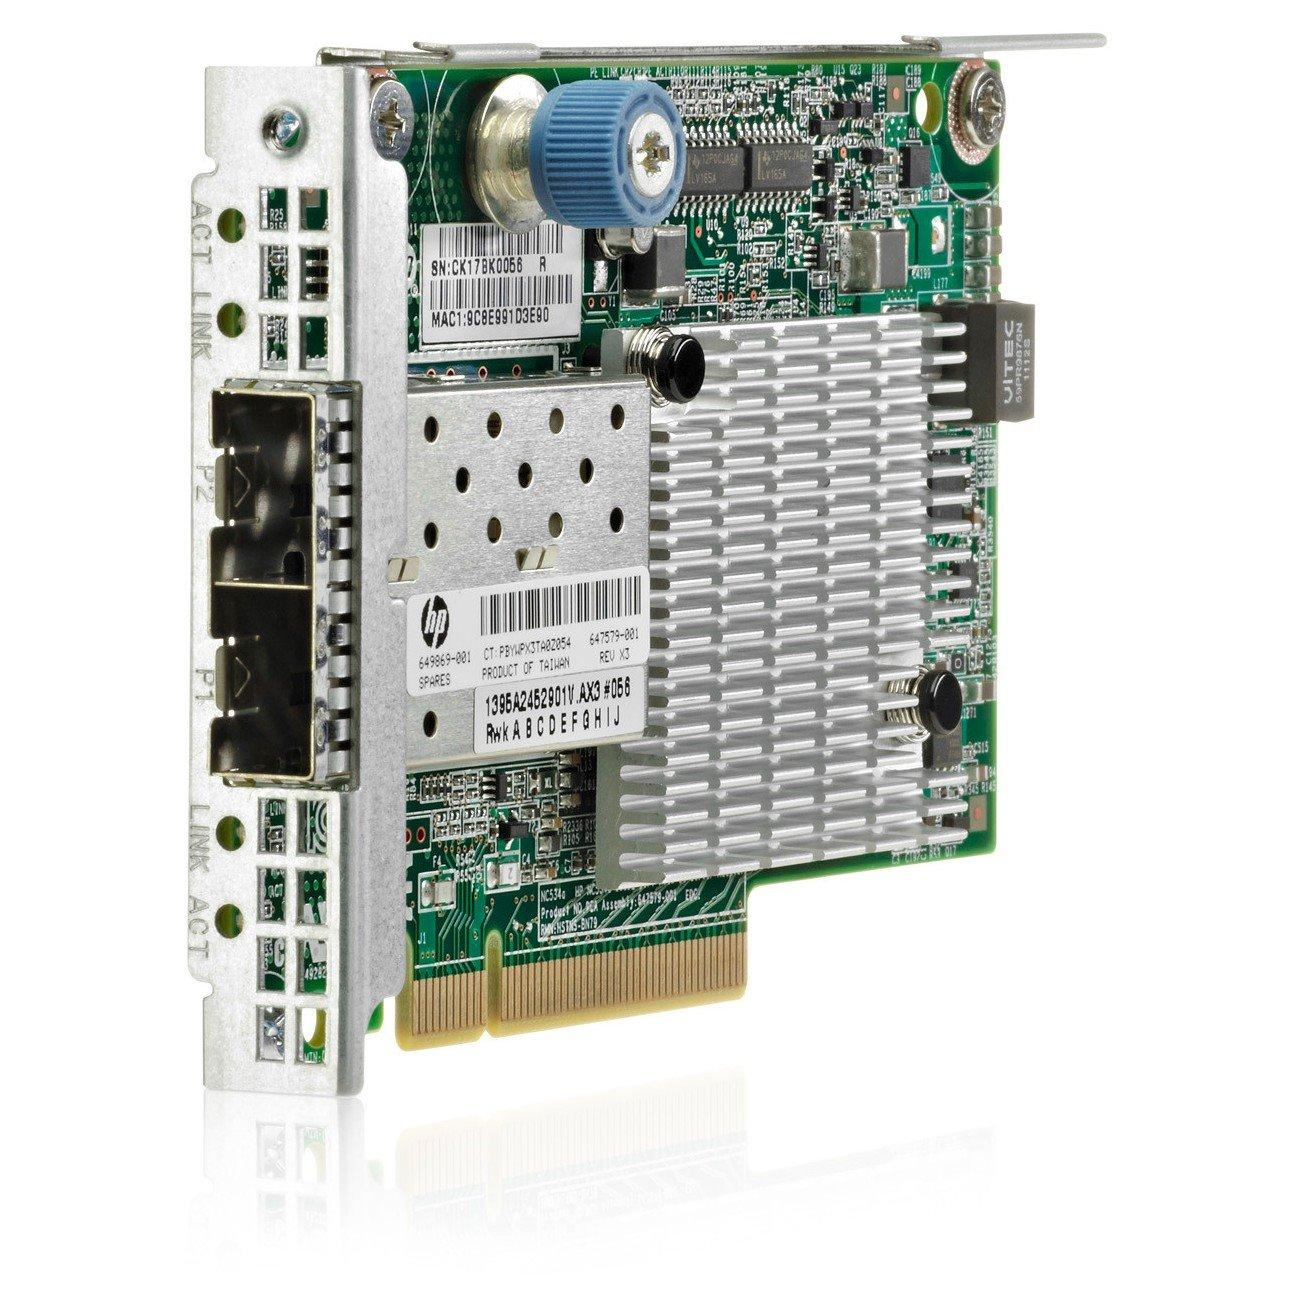 HPE FlexFabric 534FLR-SFP+ 10Gigabit Ethernet Card for PC